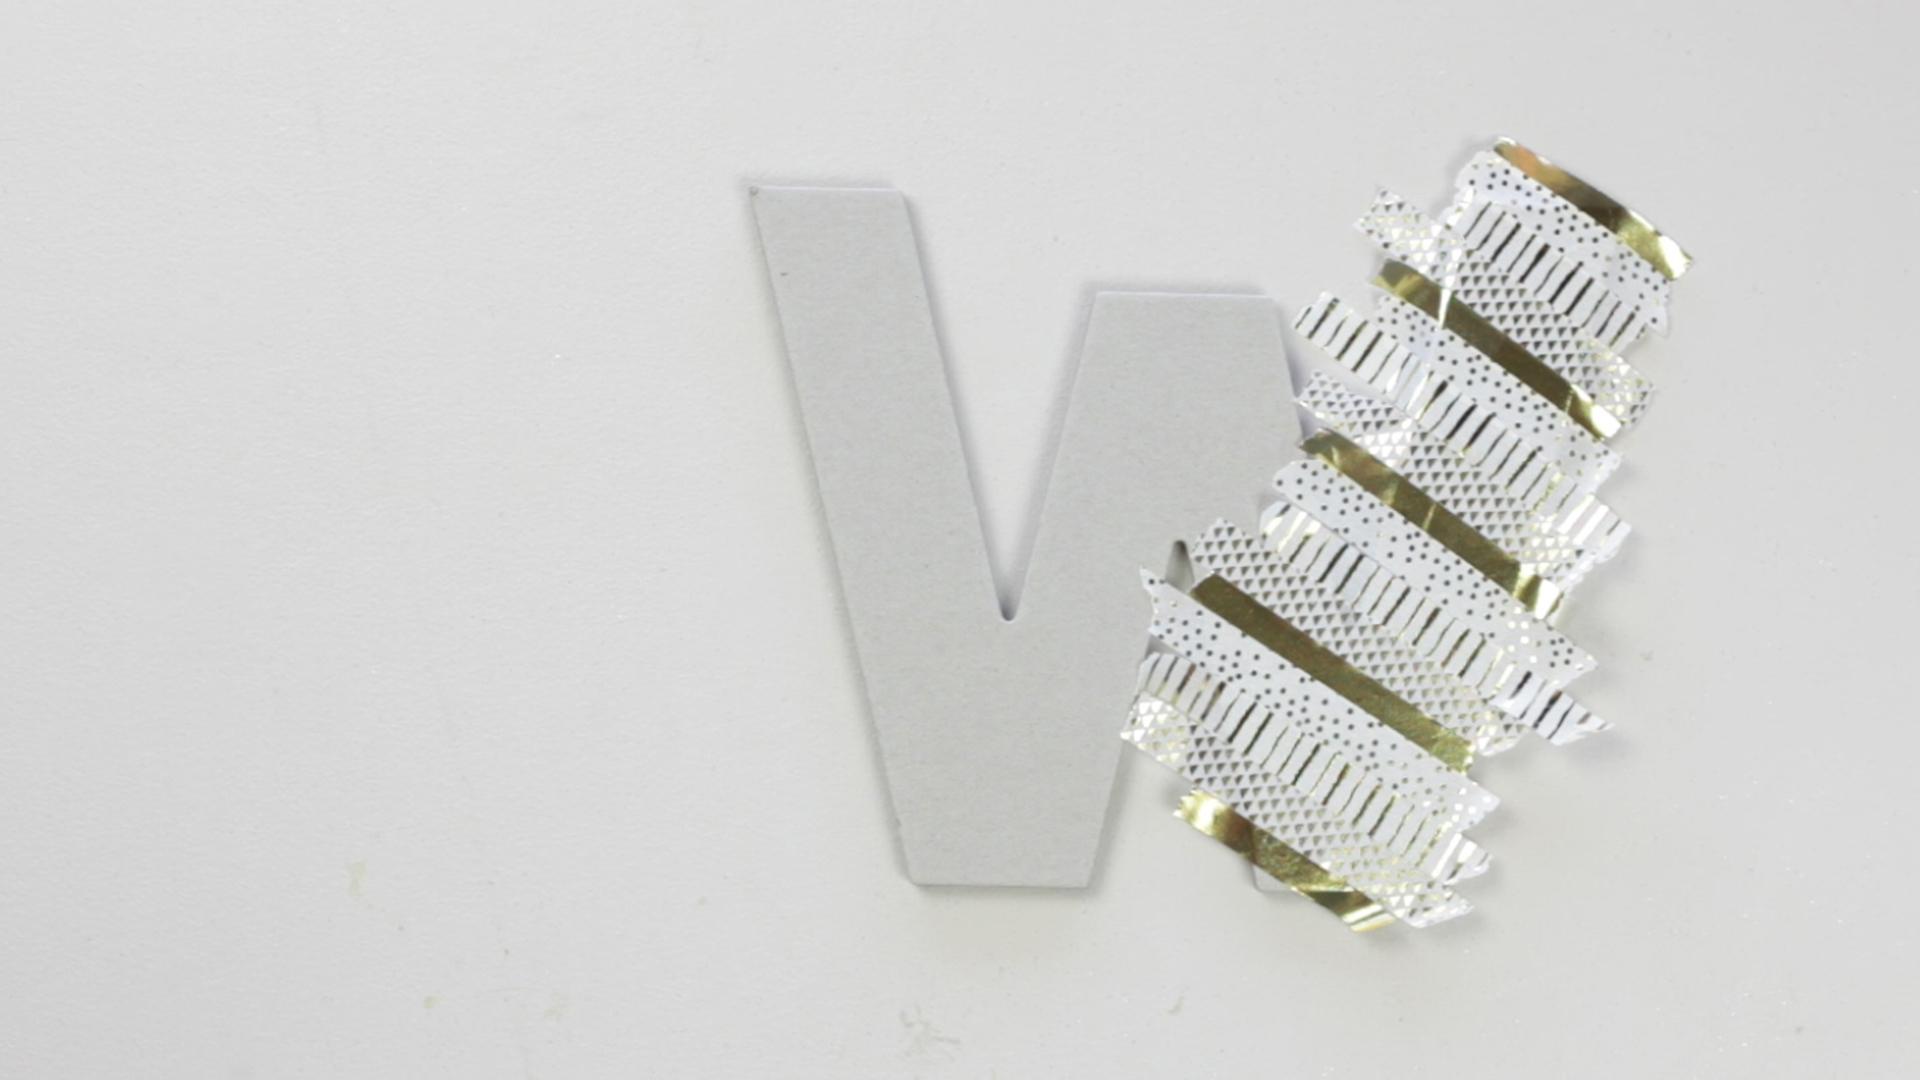 diy-washi-tape-monogram-letter-2